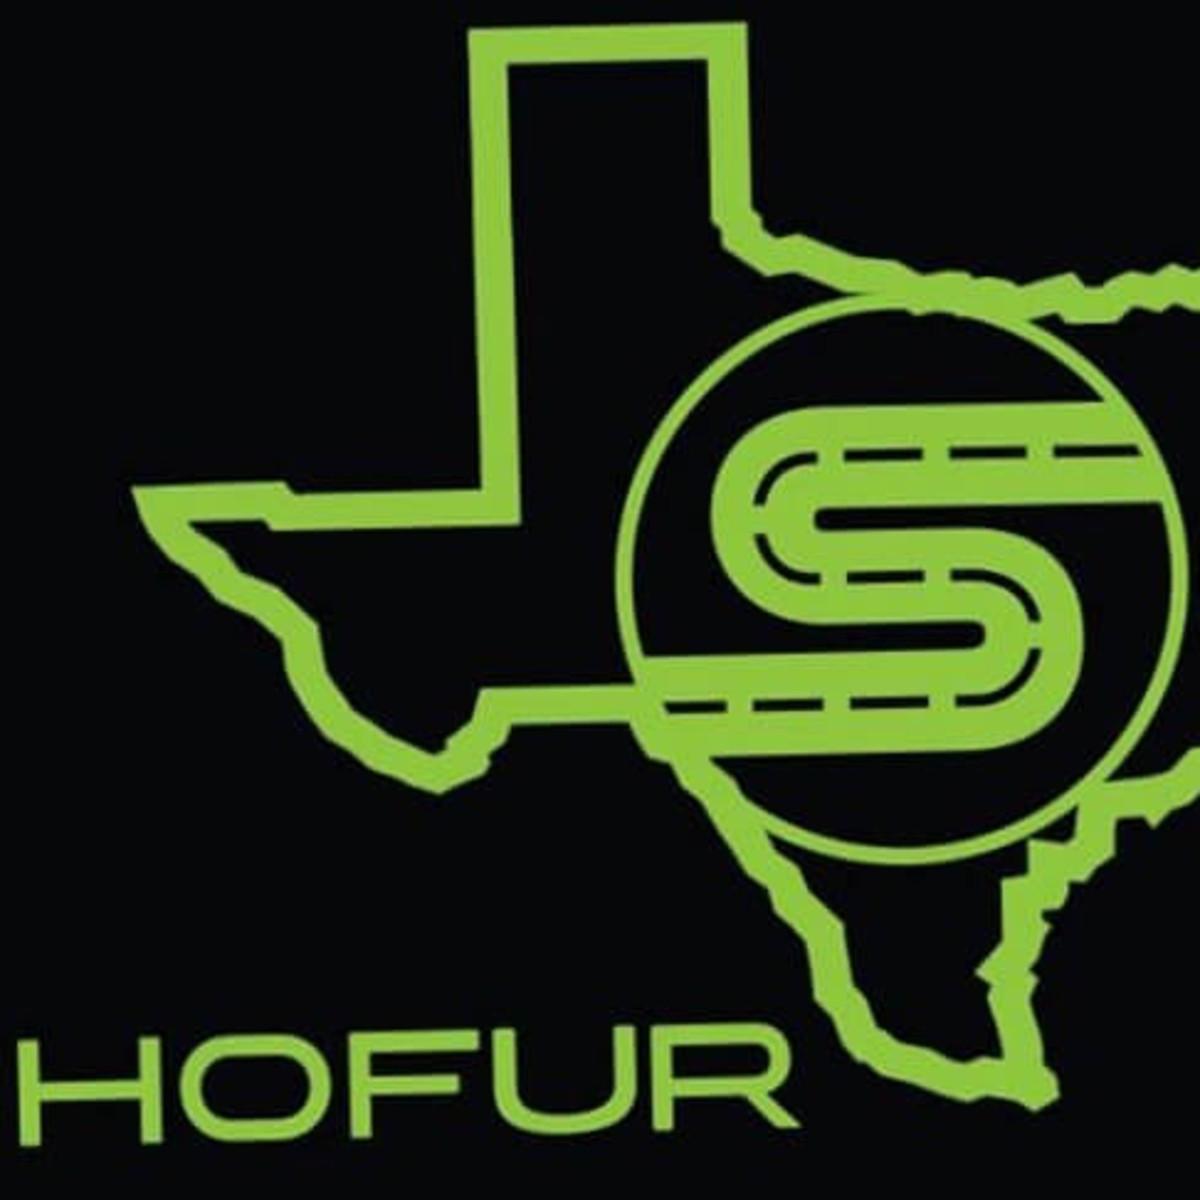 Shofur Texas logo